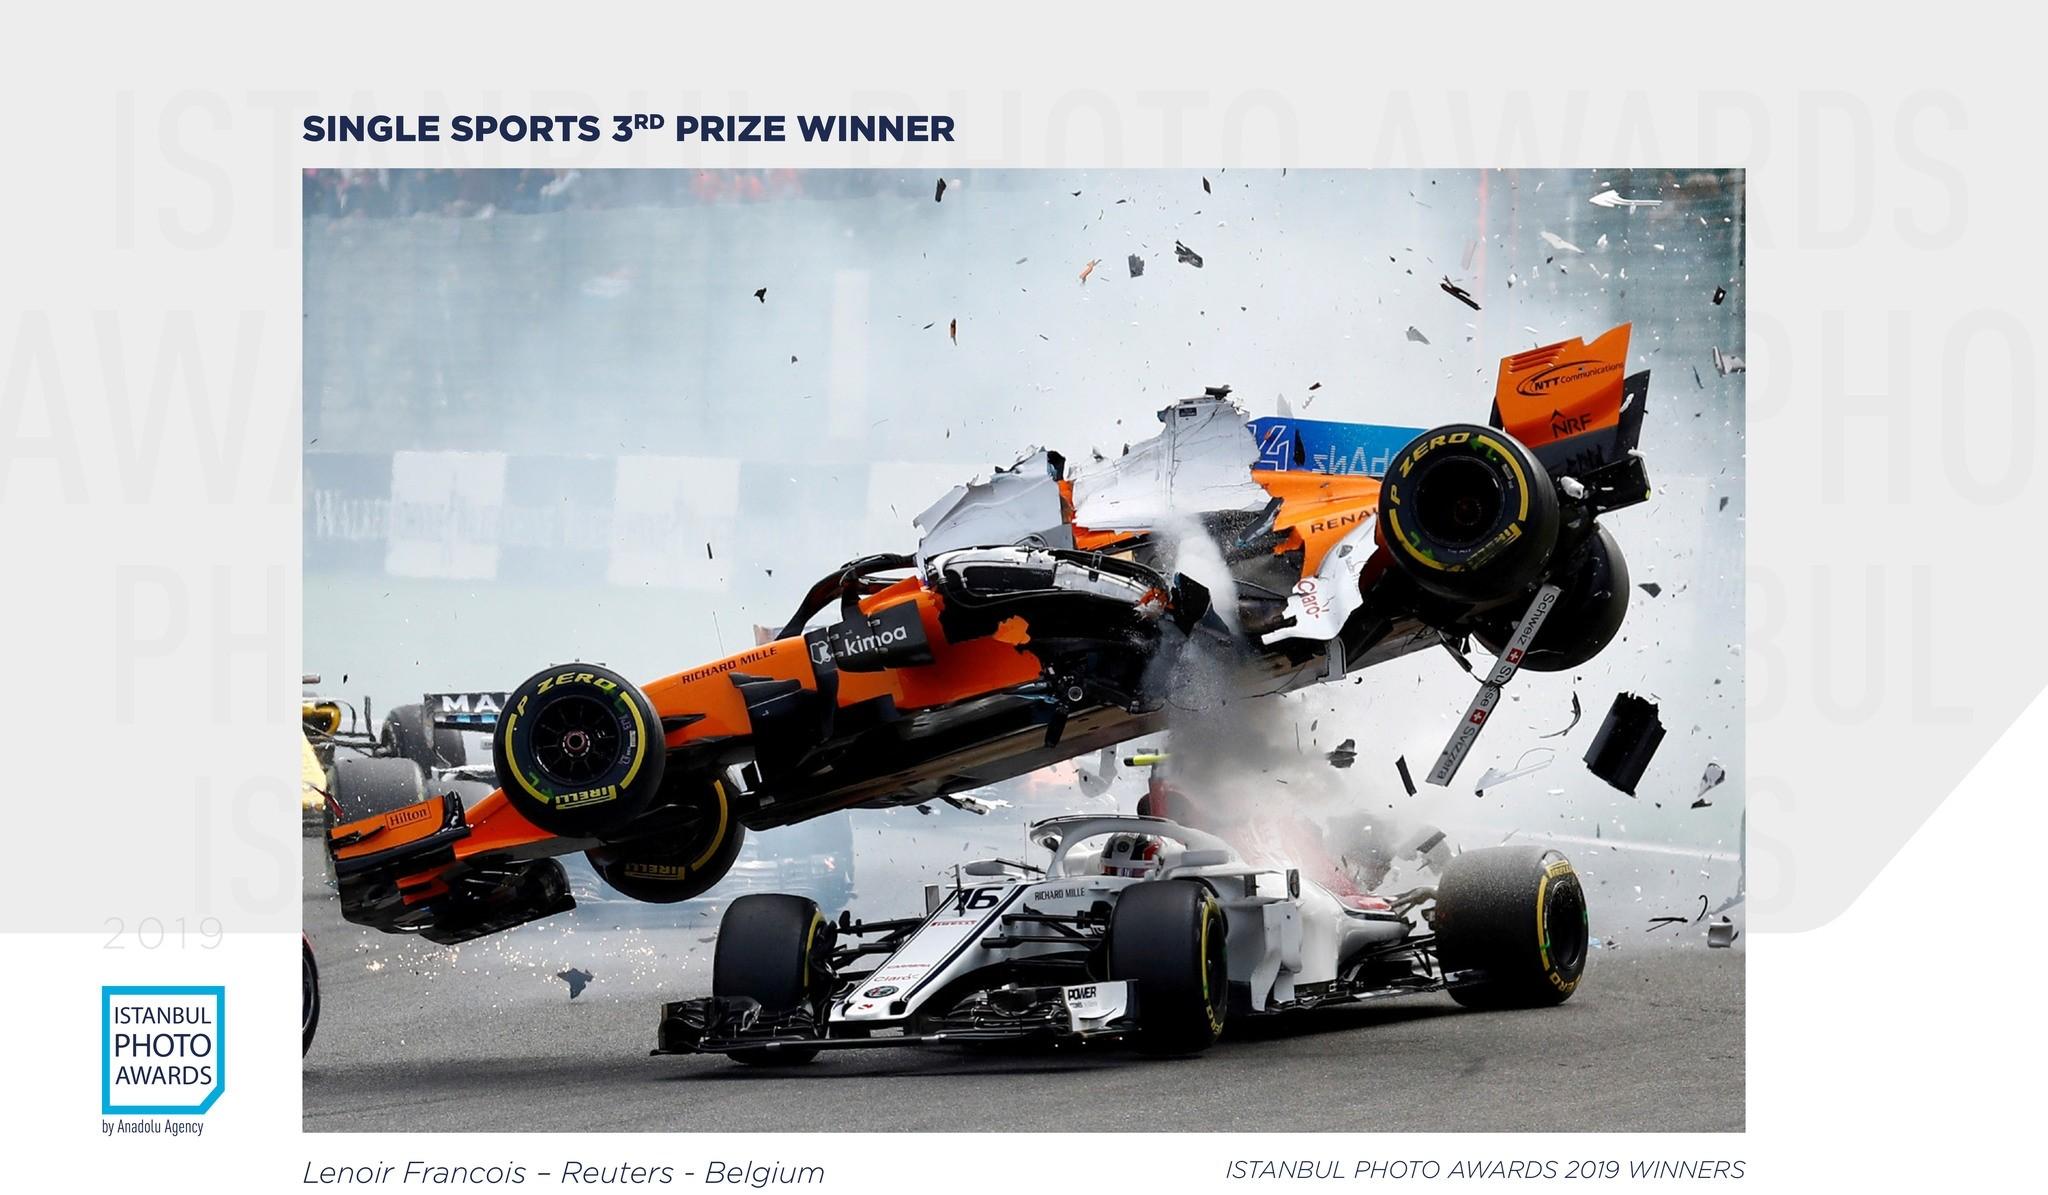 Single Sports 3rd Prize — F1 crash at Spa-Francorchamps